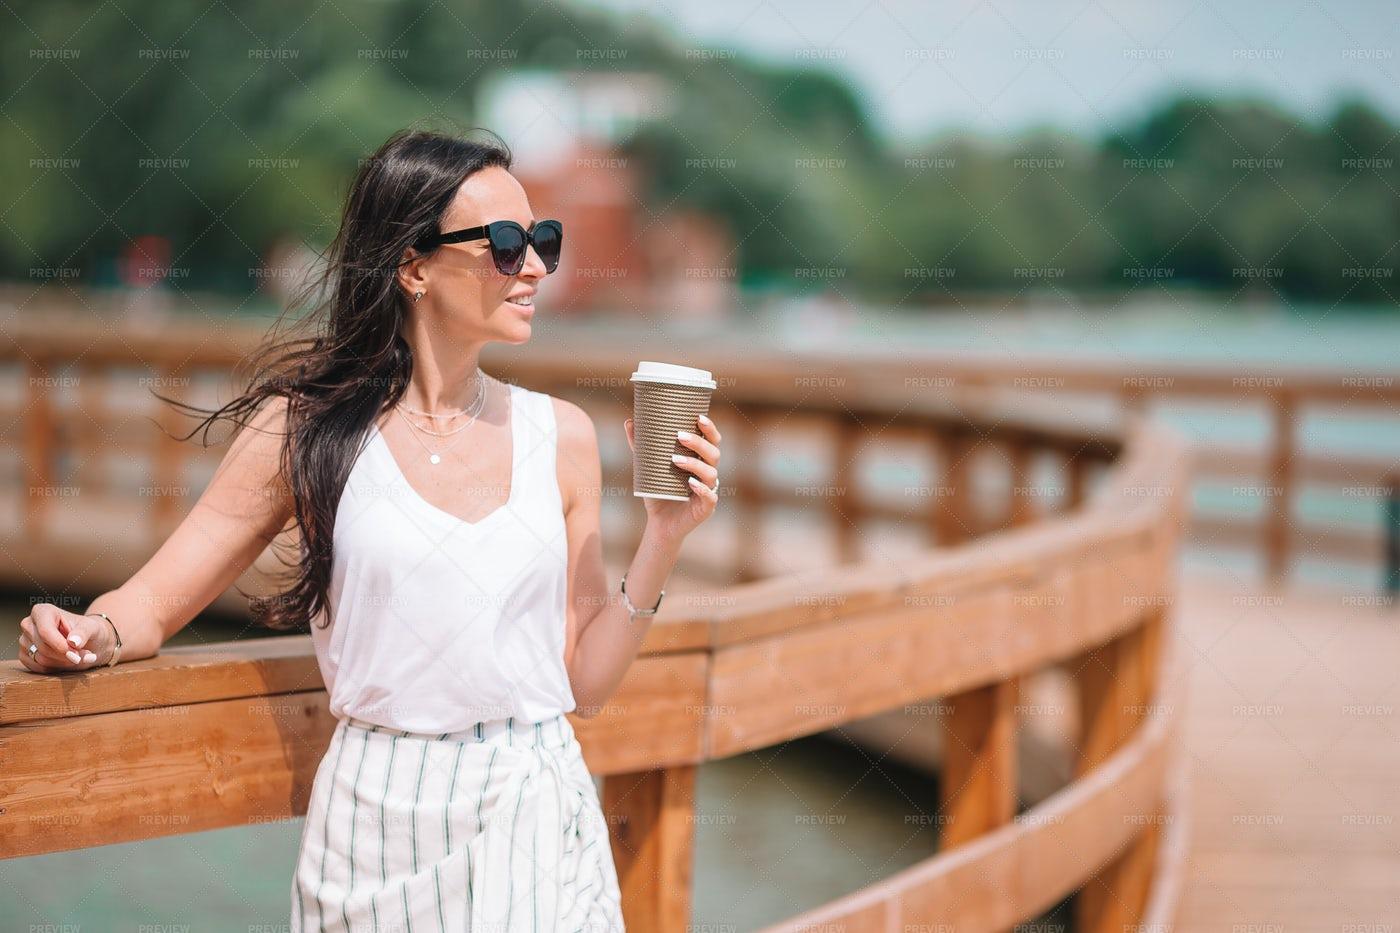 Woman On A Bridge: Stock Photos